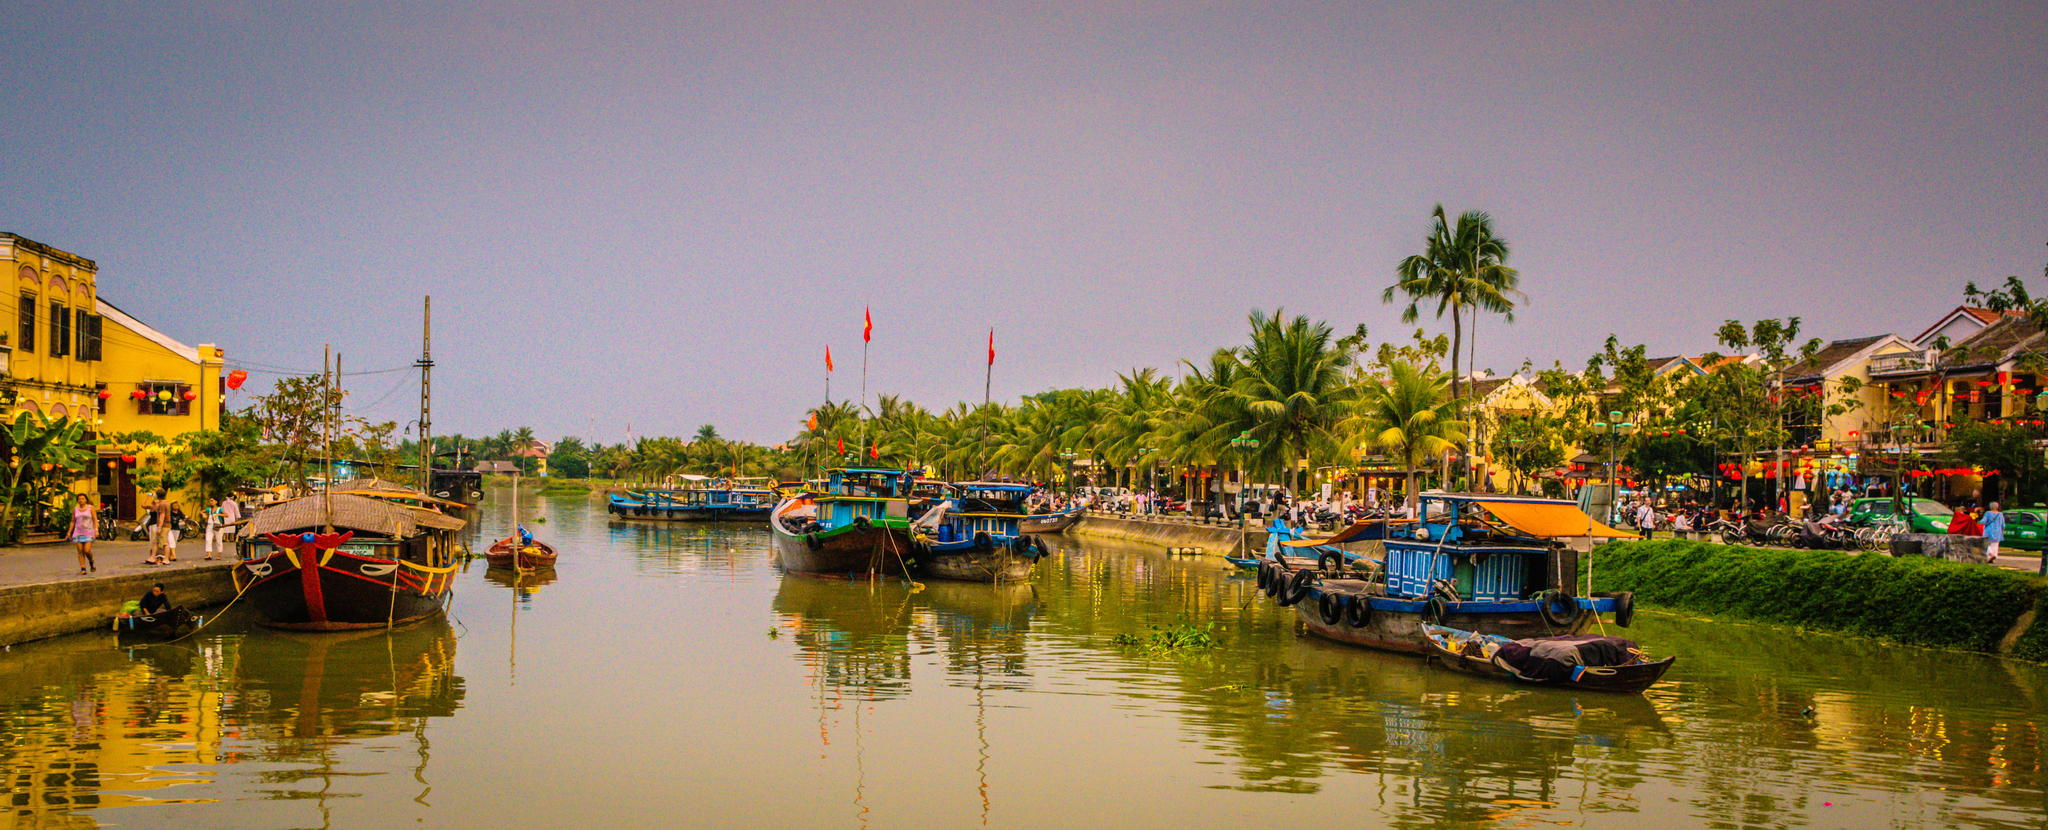 Река | Хойан | Вьетнам| Турагентство Мультипасс | 8 (499) 653-6300